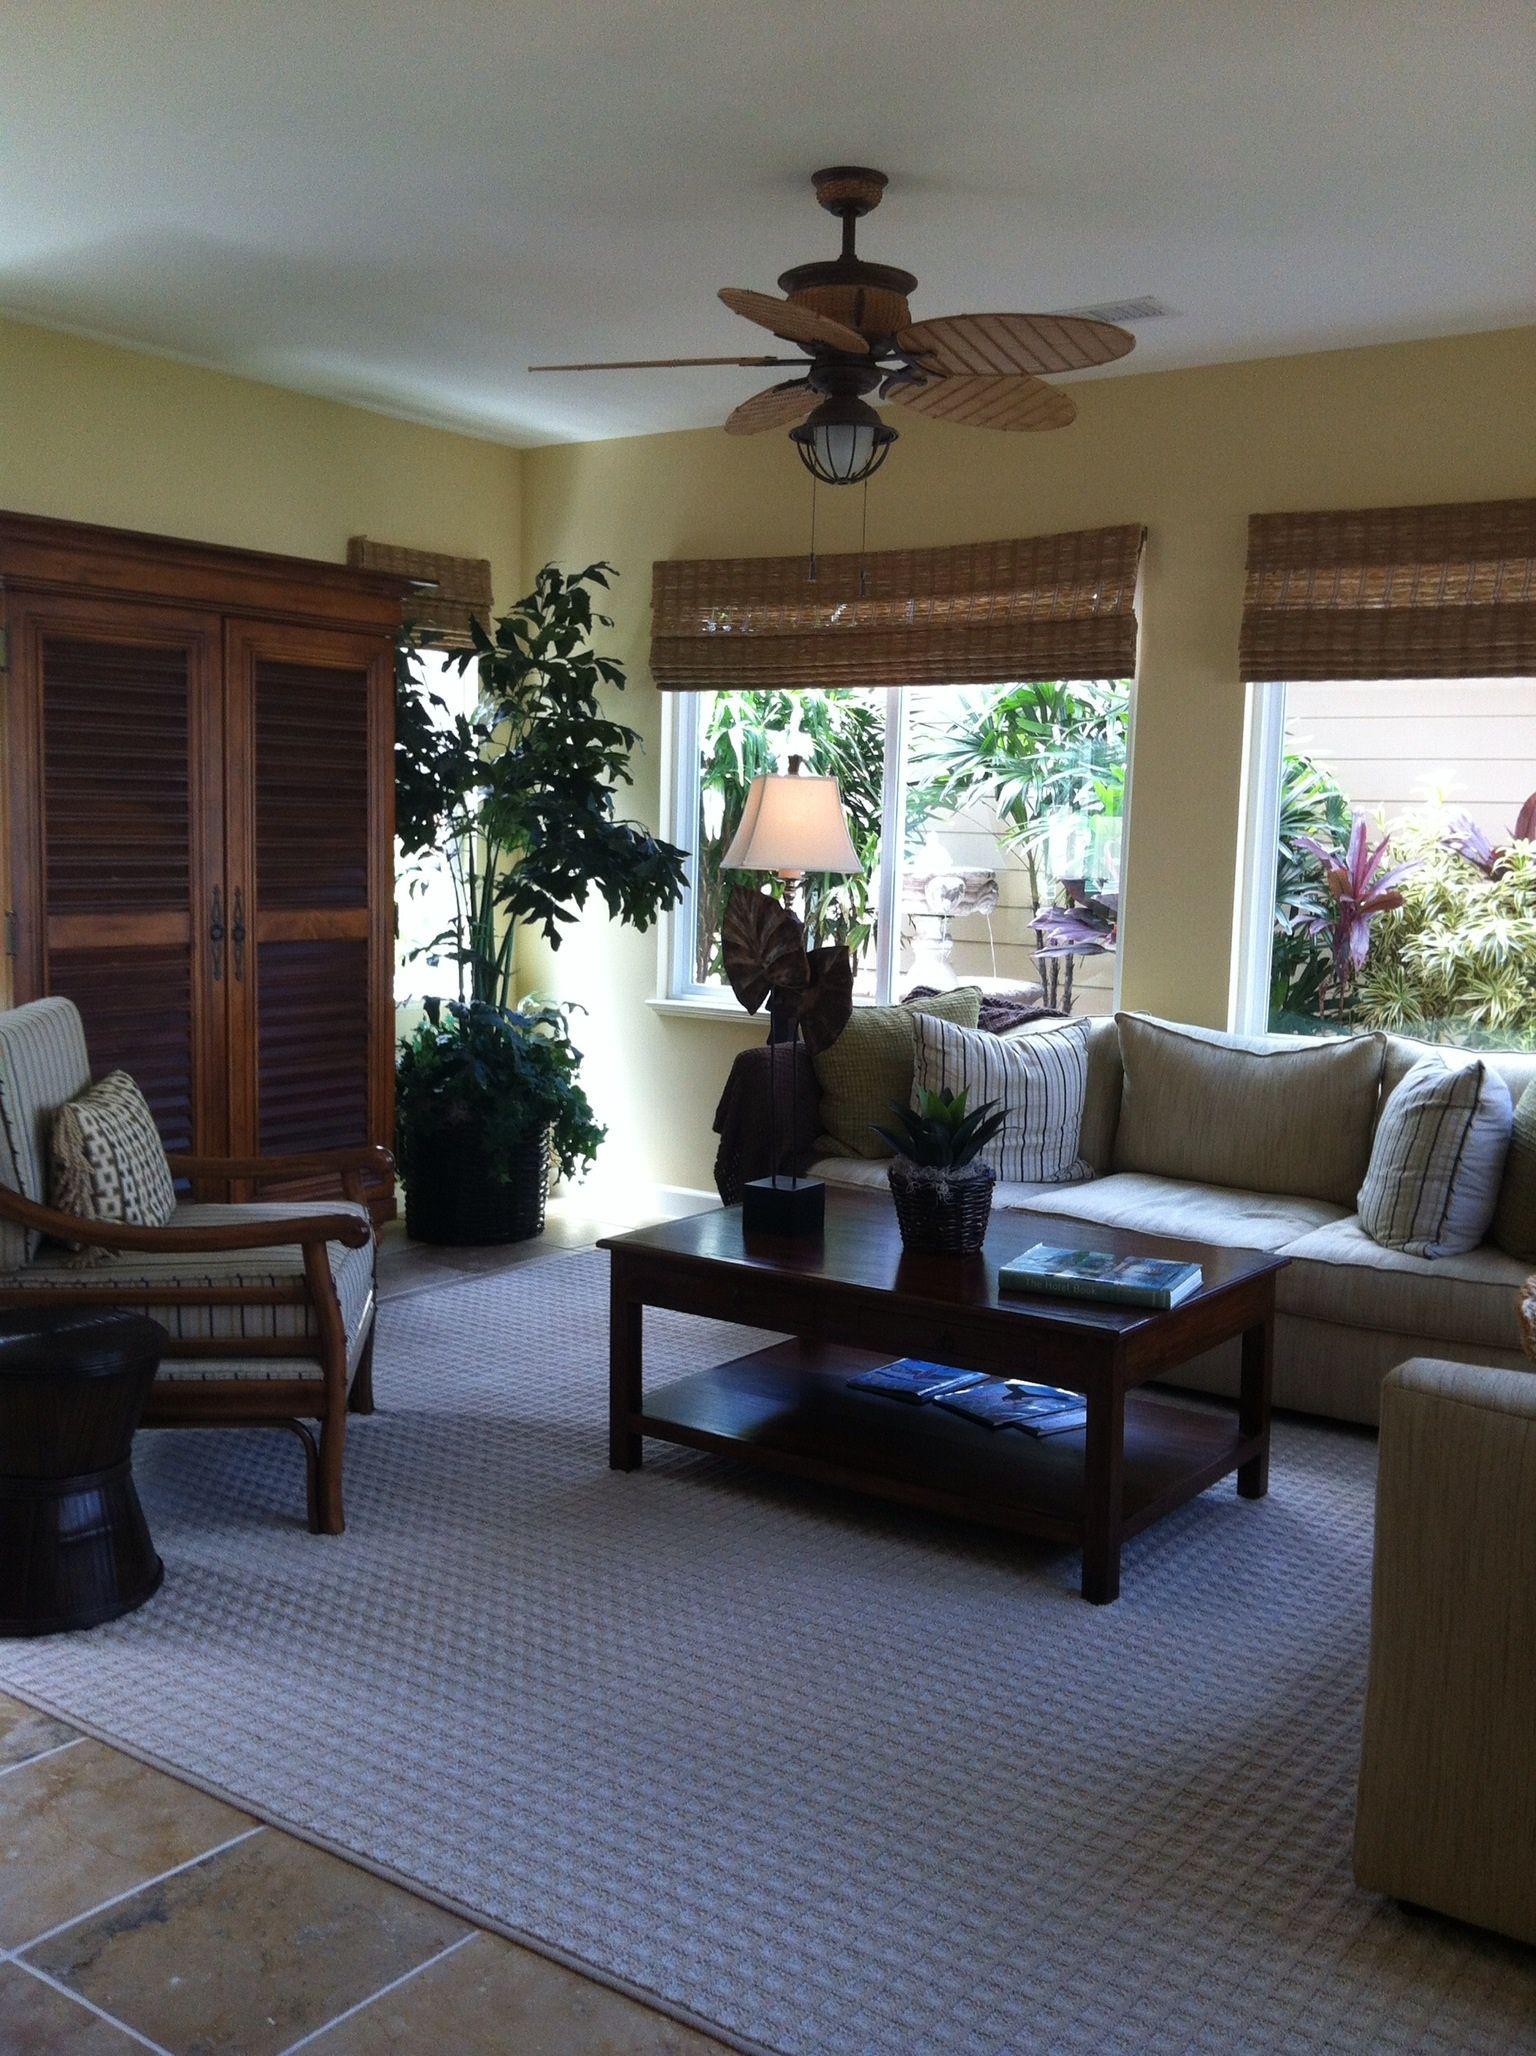 Beach House Style Decorating, Sunroom Decorating, Sunroom Designs